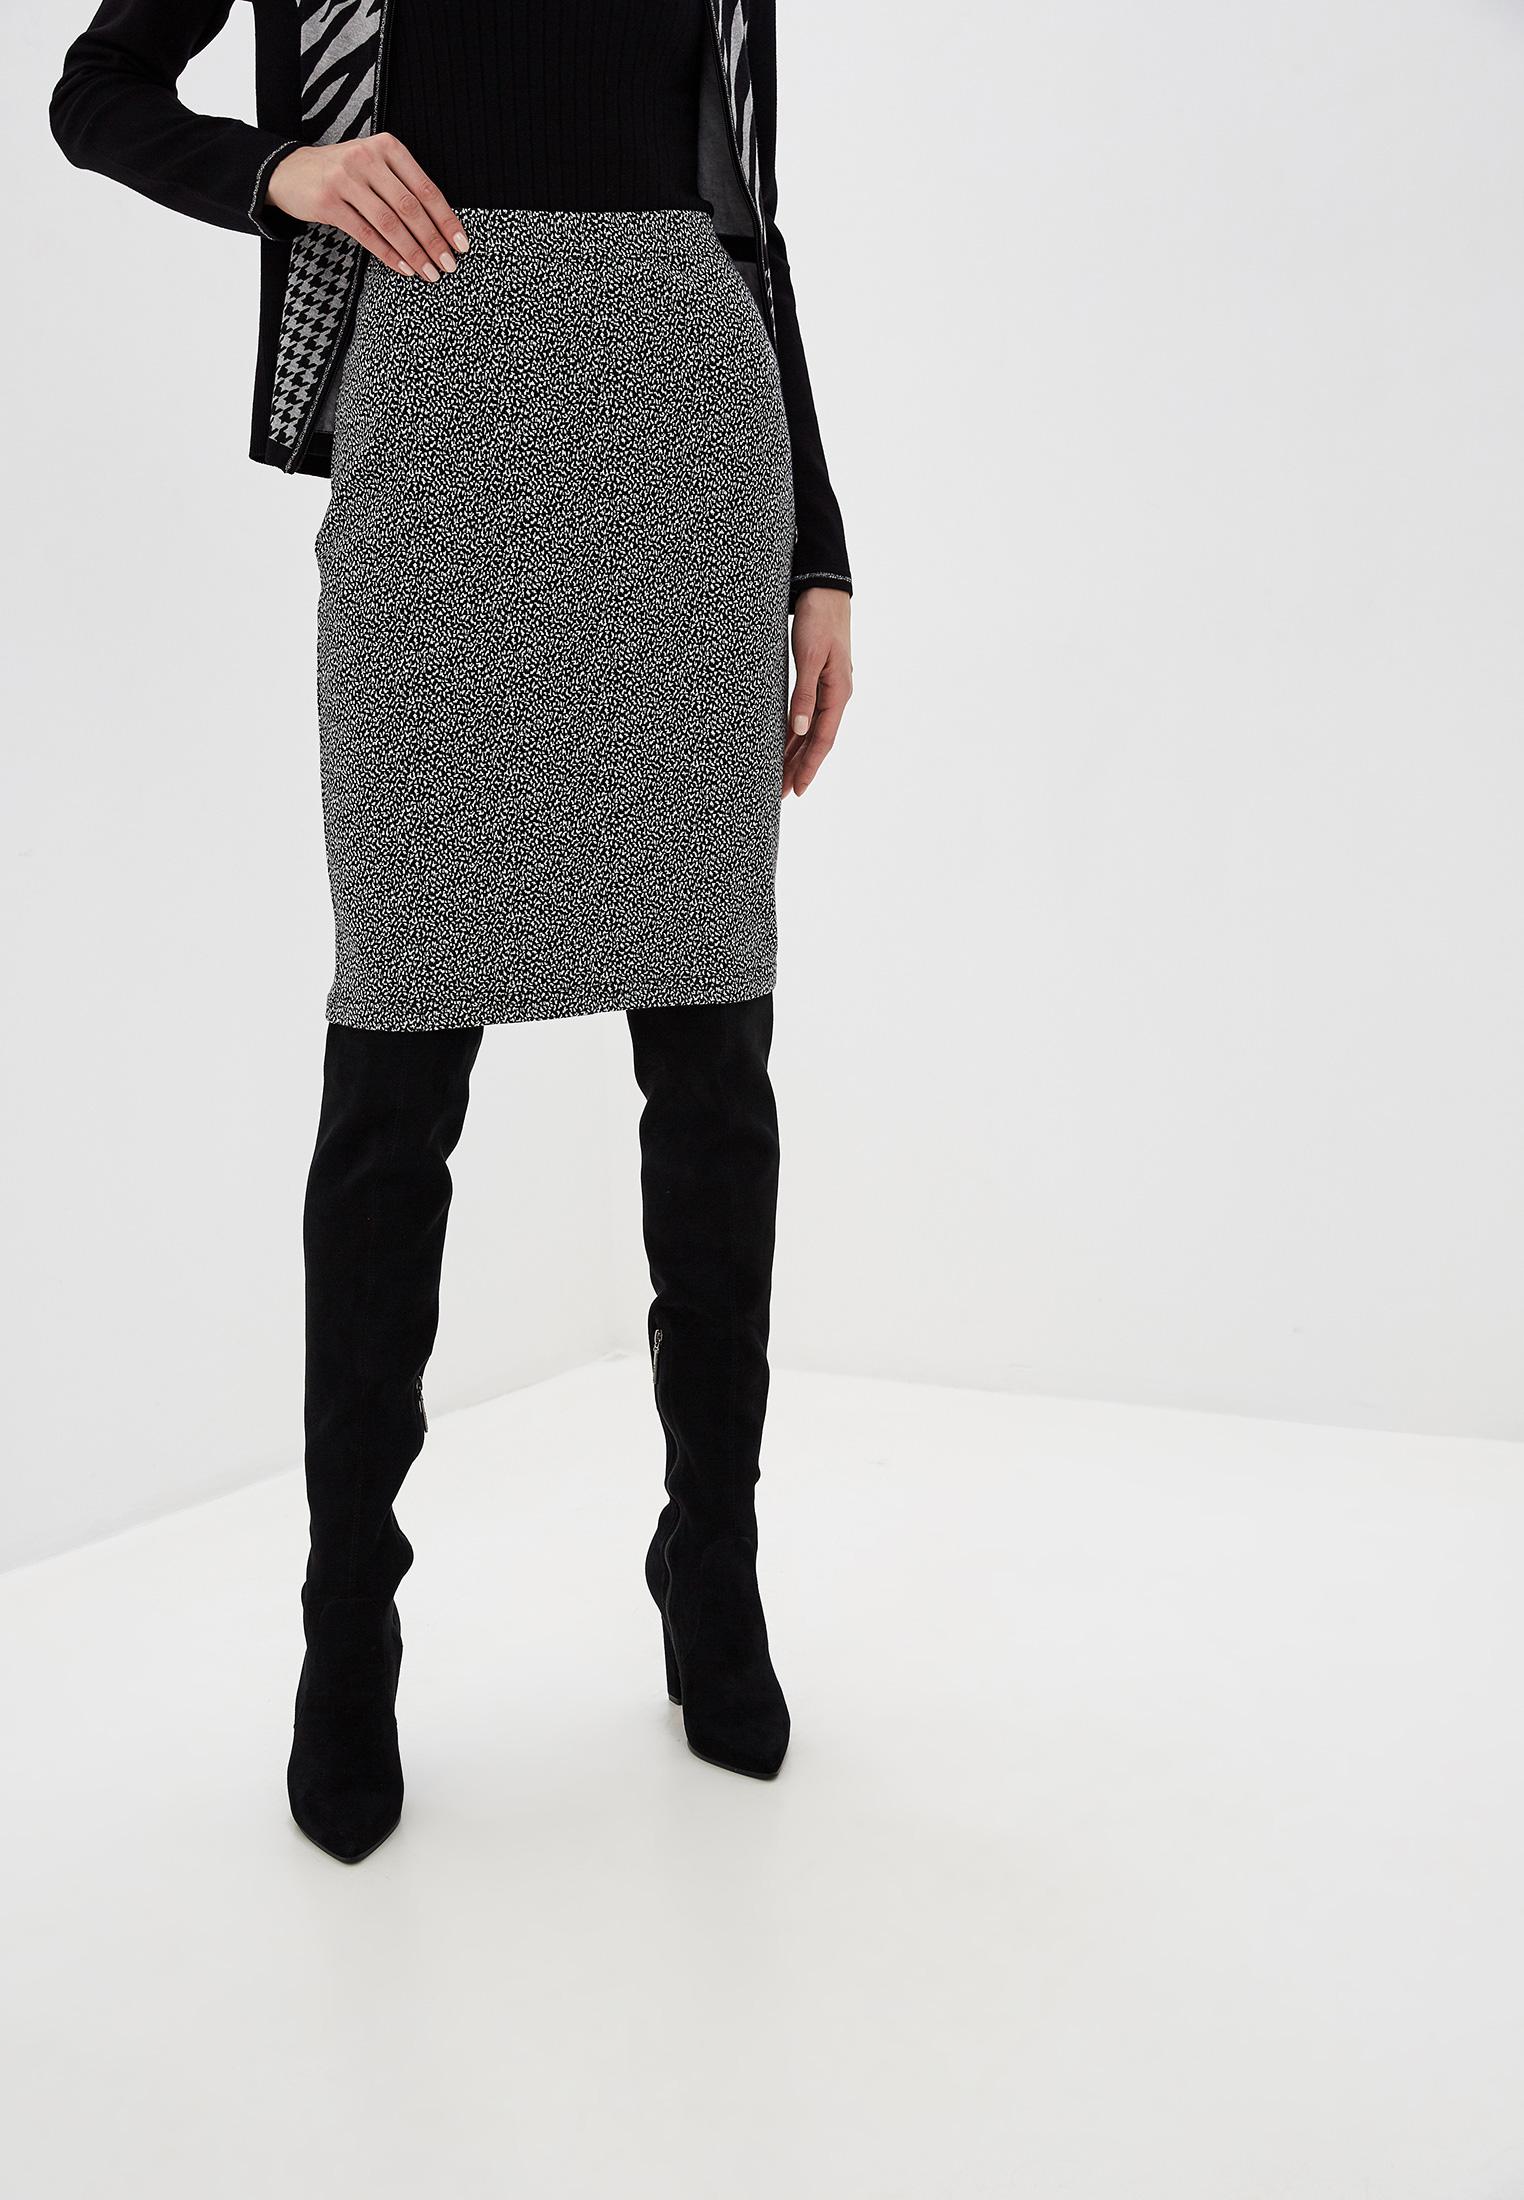 Прямая юбка Betty Barclay 5703/0557